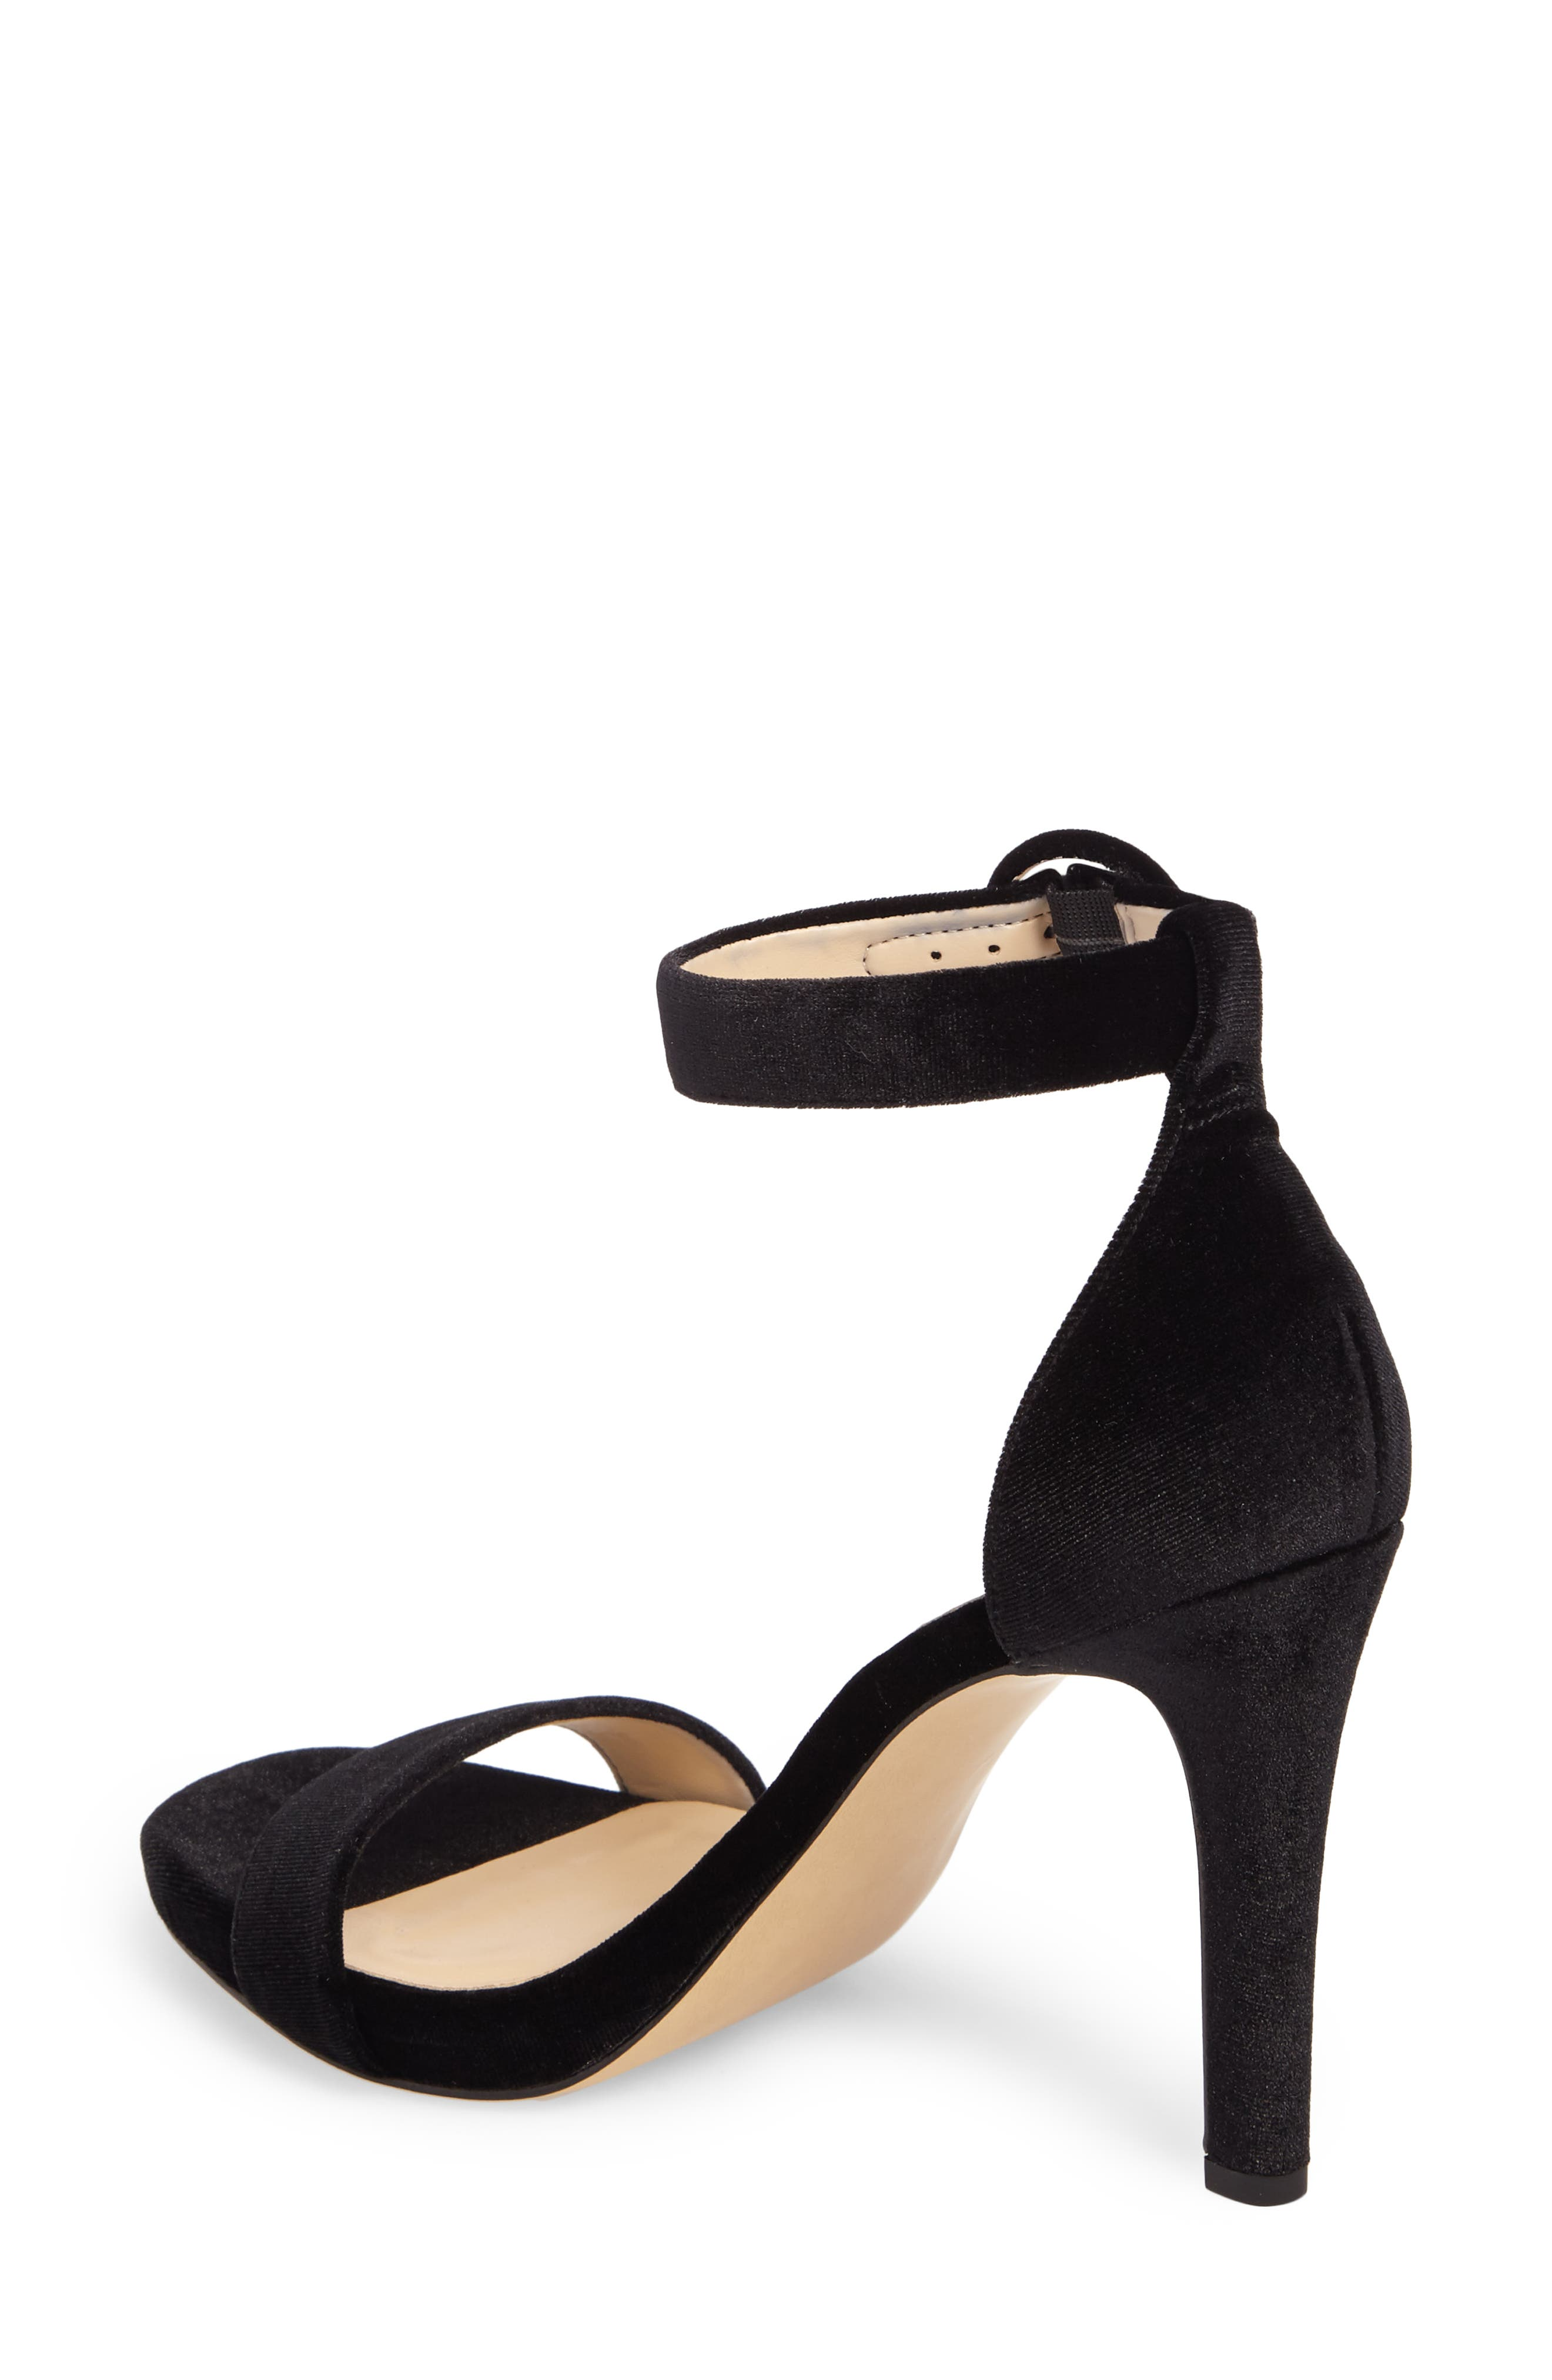 Emelia Ankle Strap Sandal,                             Alternate thumbnail 2, color,                             Black